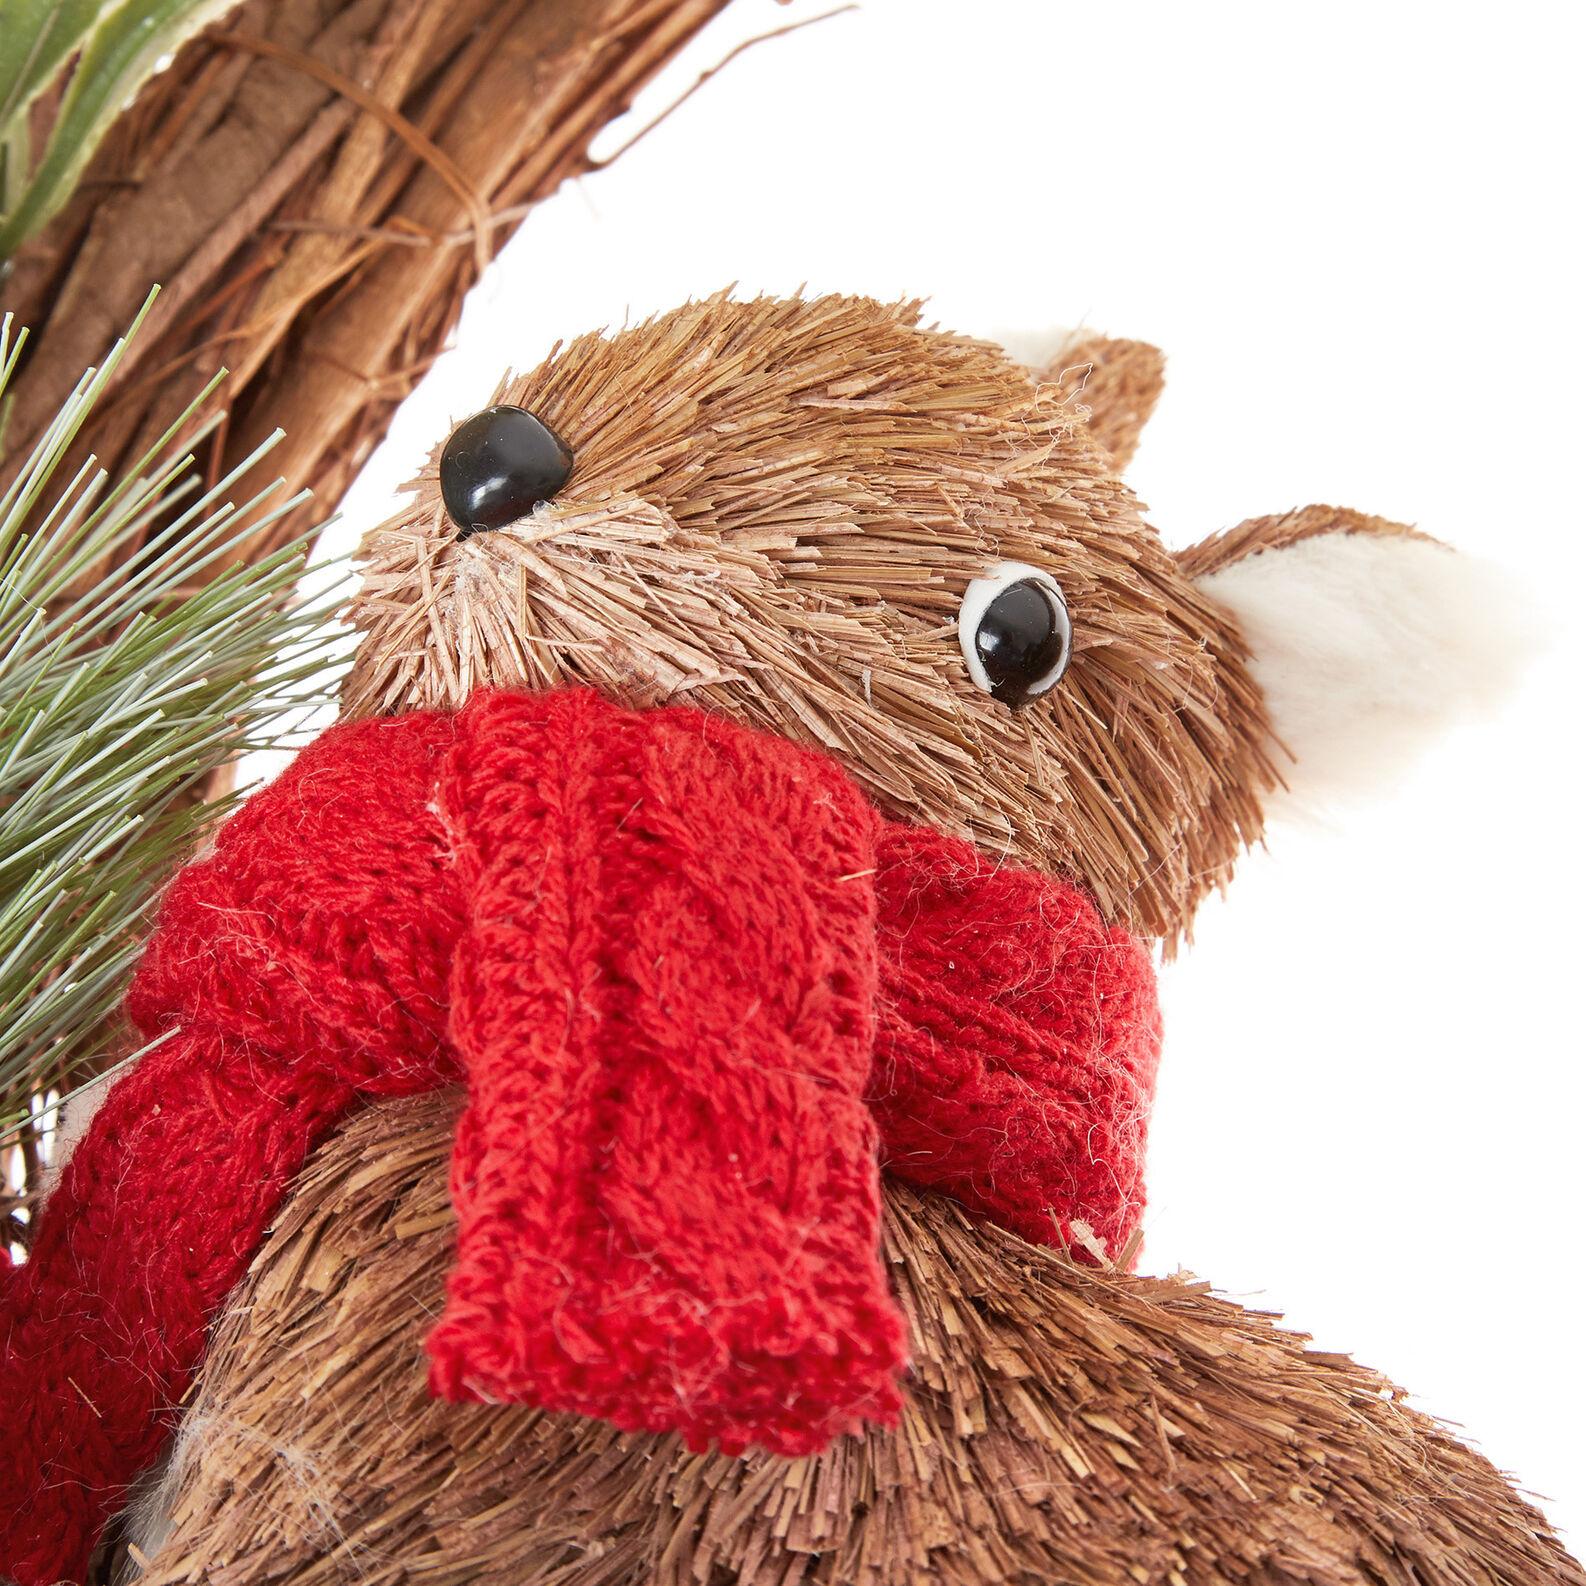 Decorative wreath with squirrel